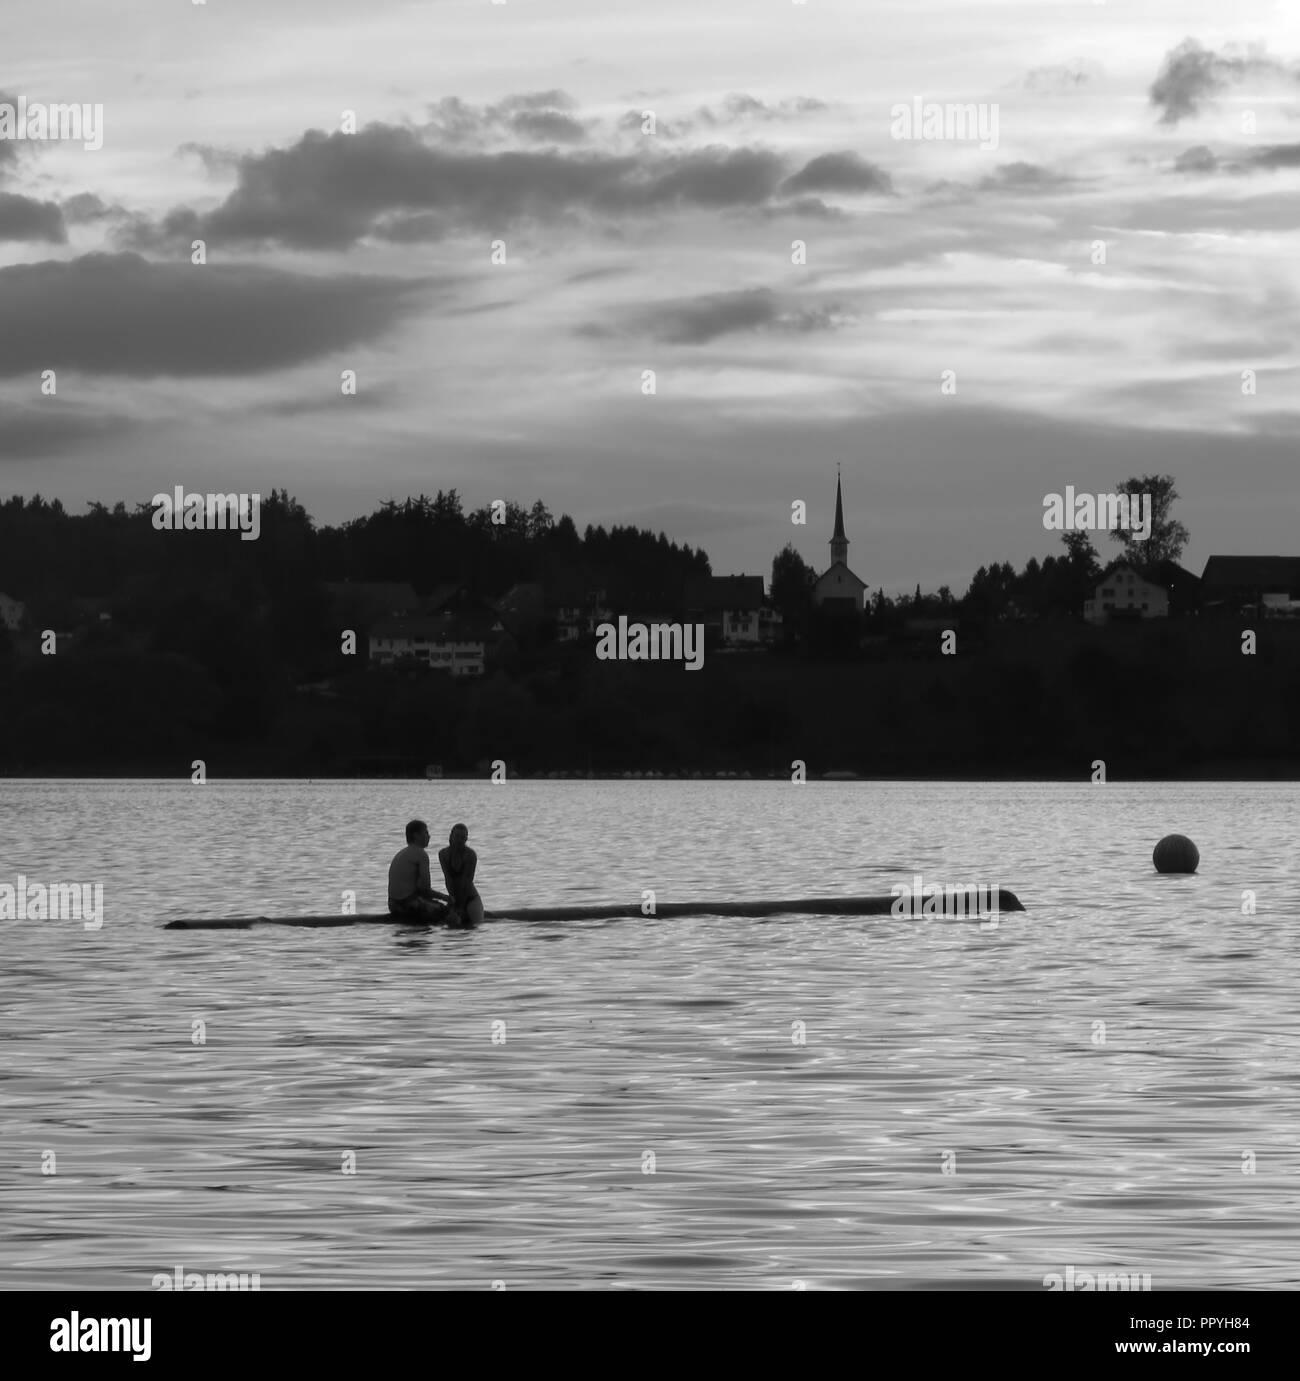 Evening scene at Lake Pfäffikon, Zürich. - Stock Image